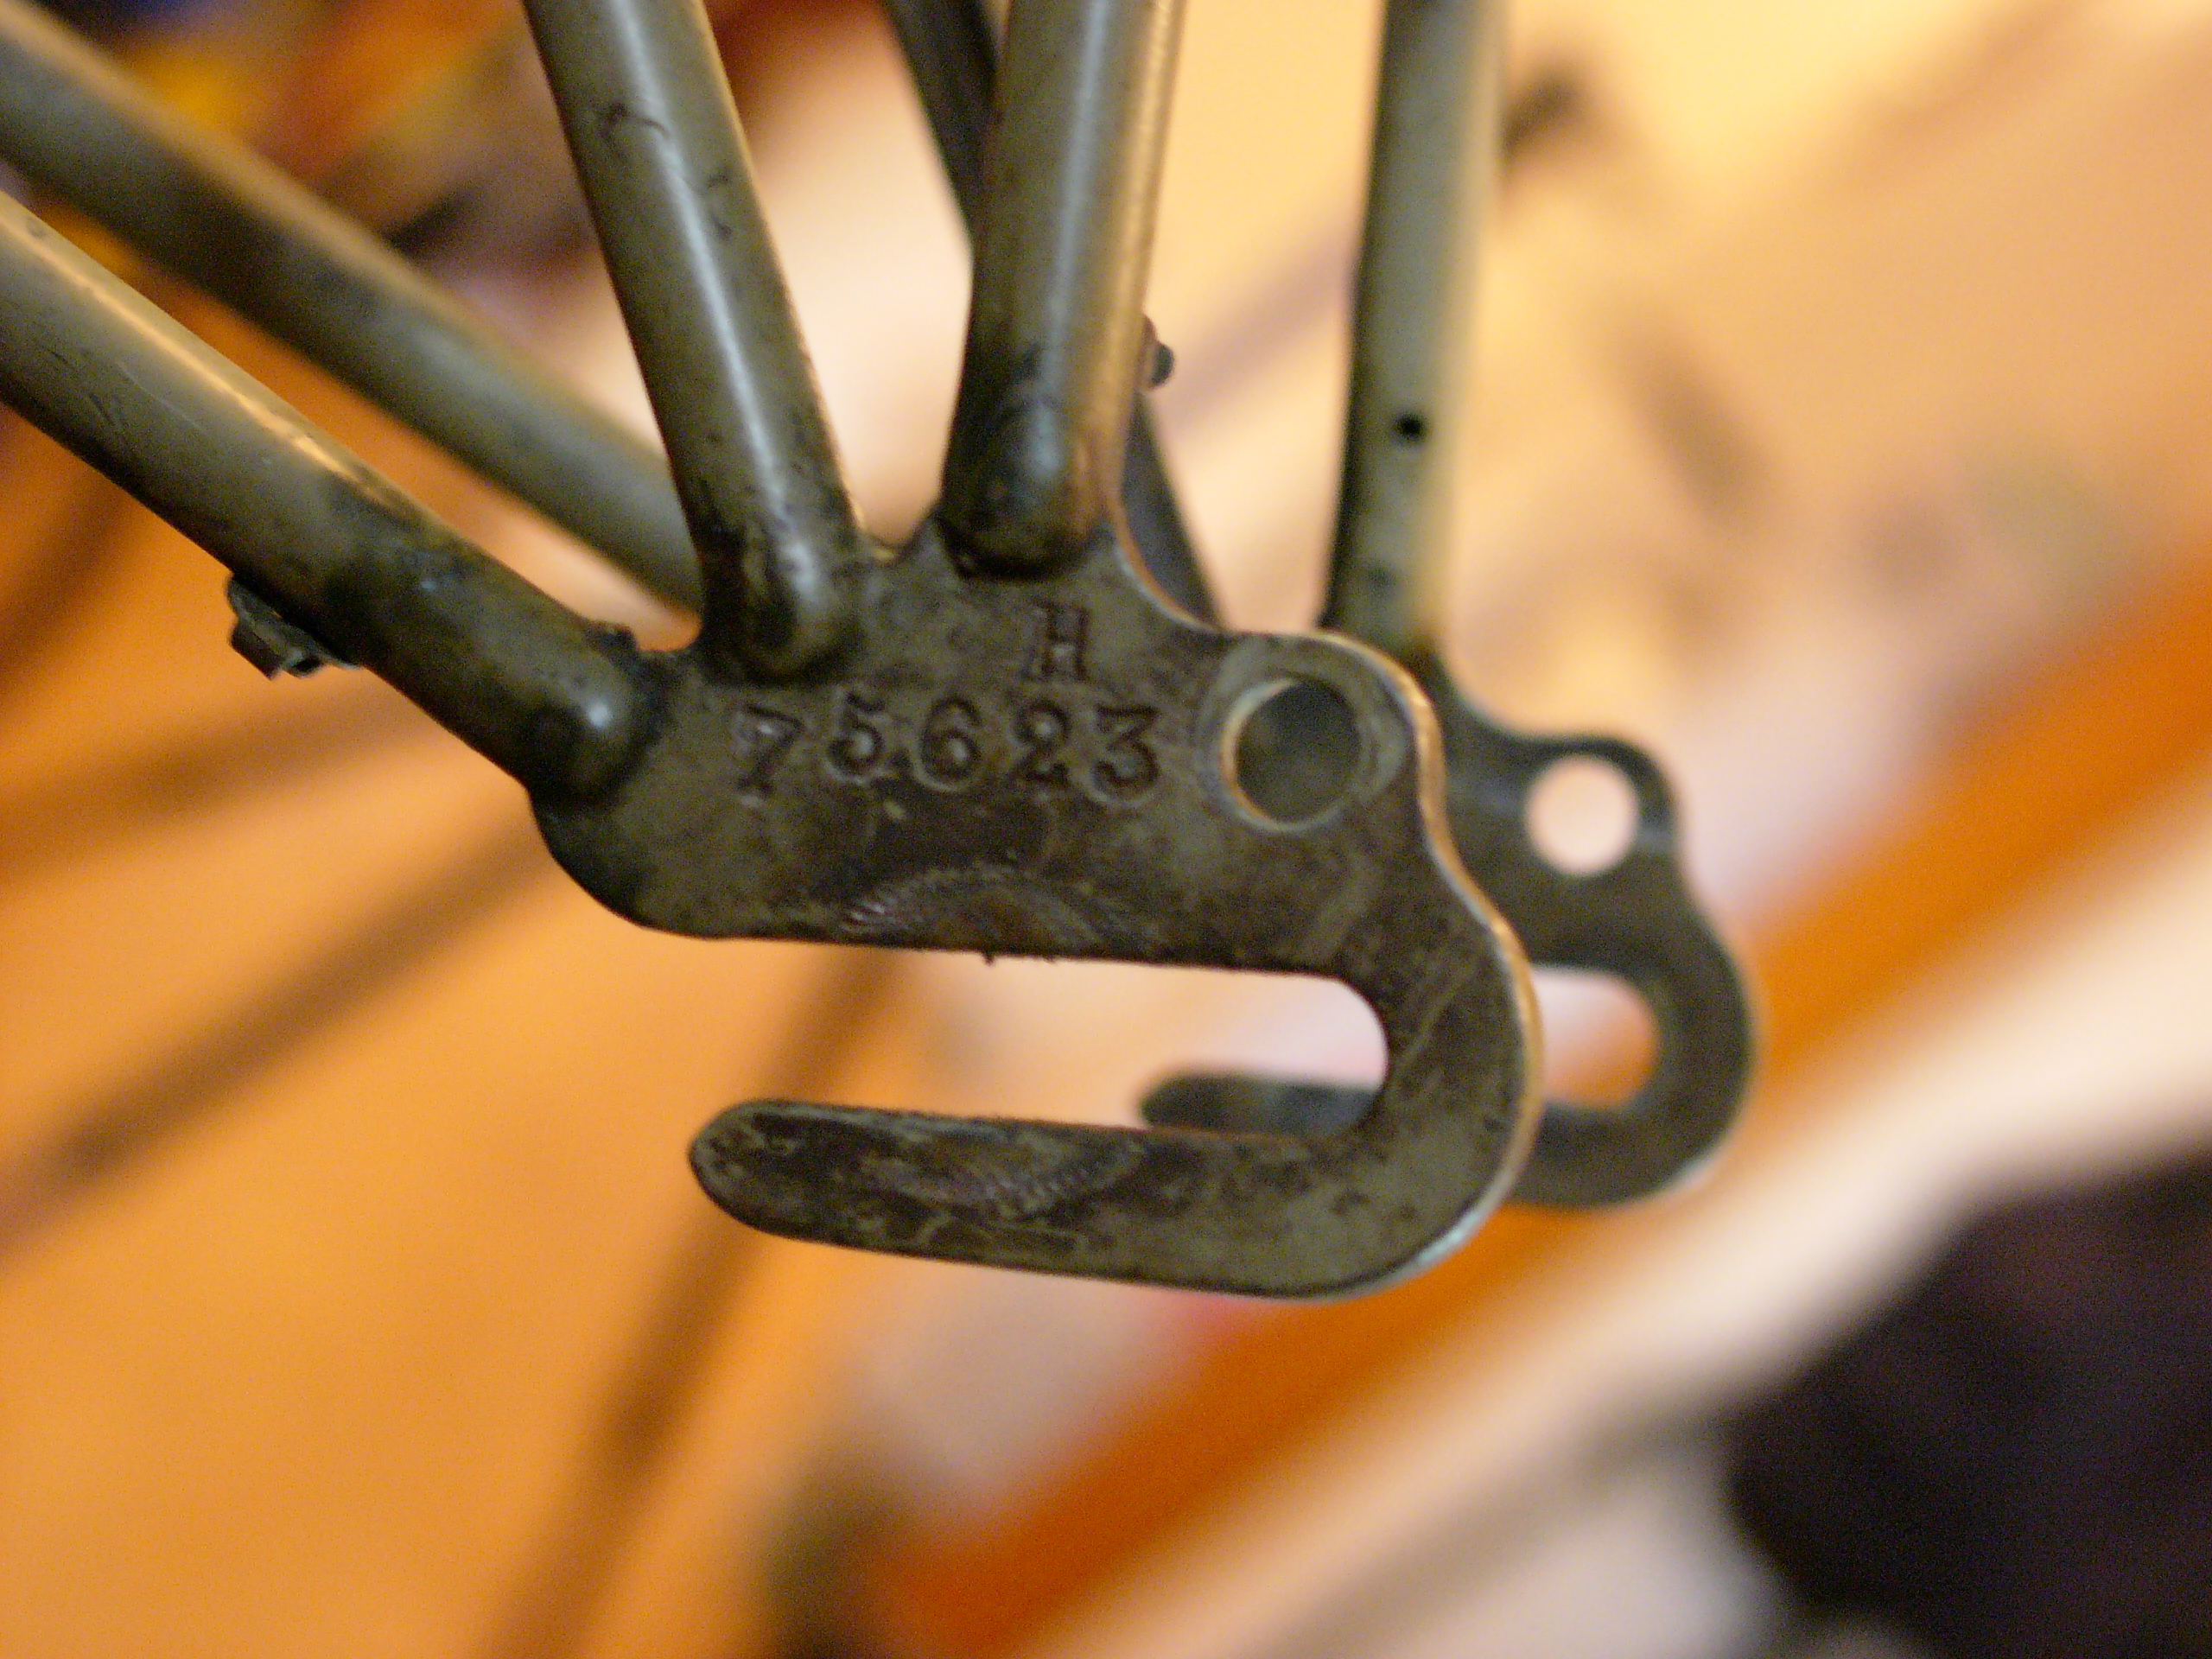 1947 Peugeot Bicycle Catalogue   Restoring Vintage Bicycles